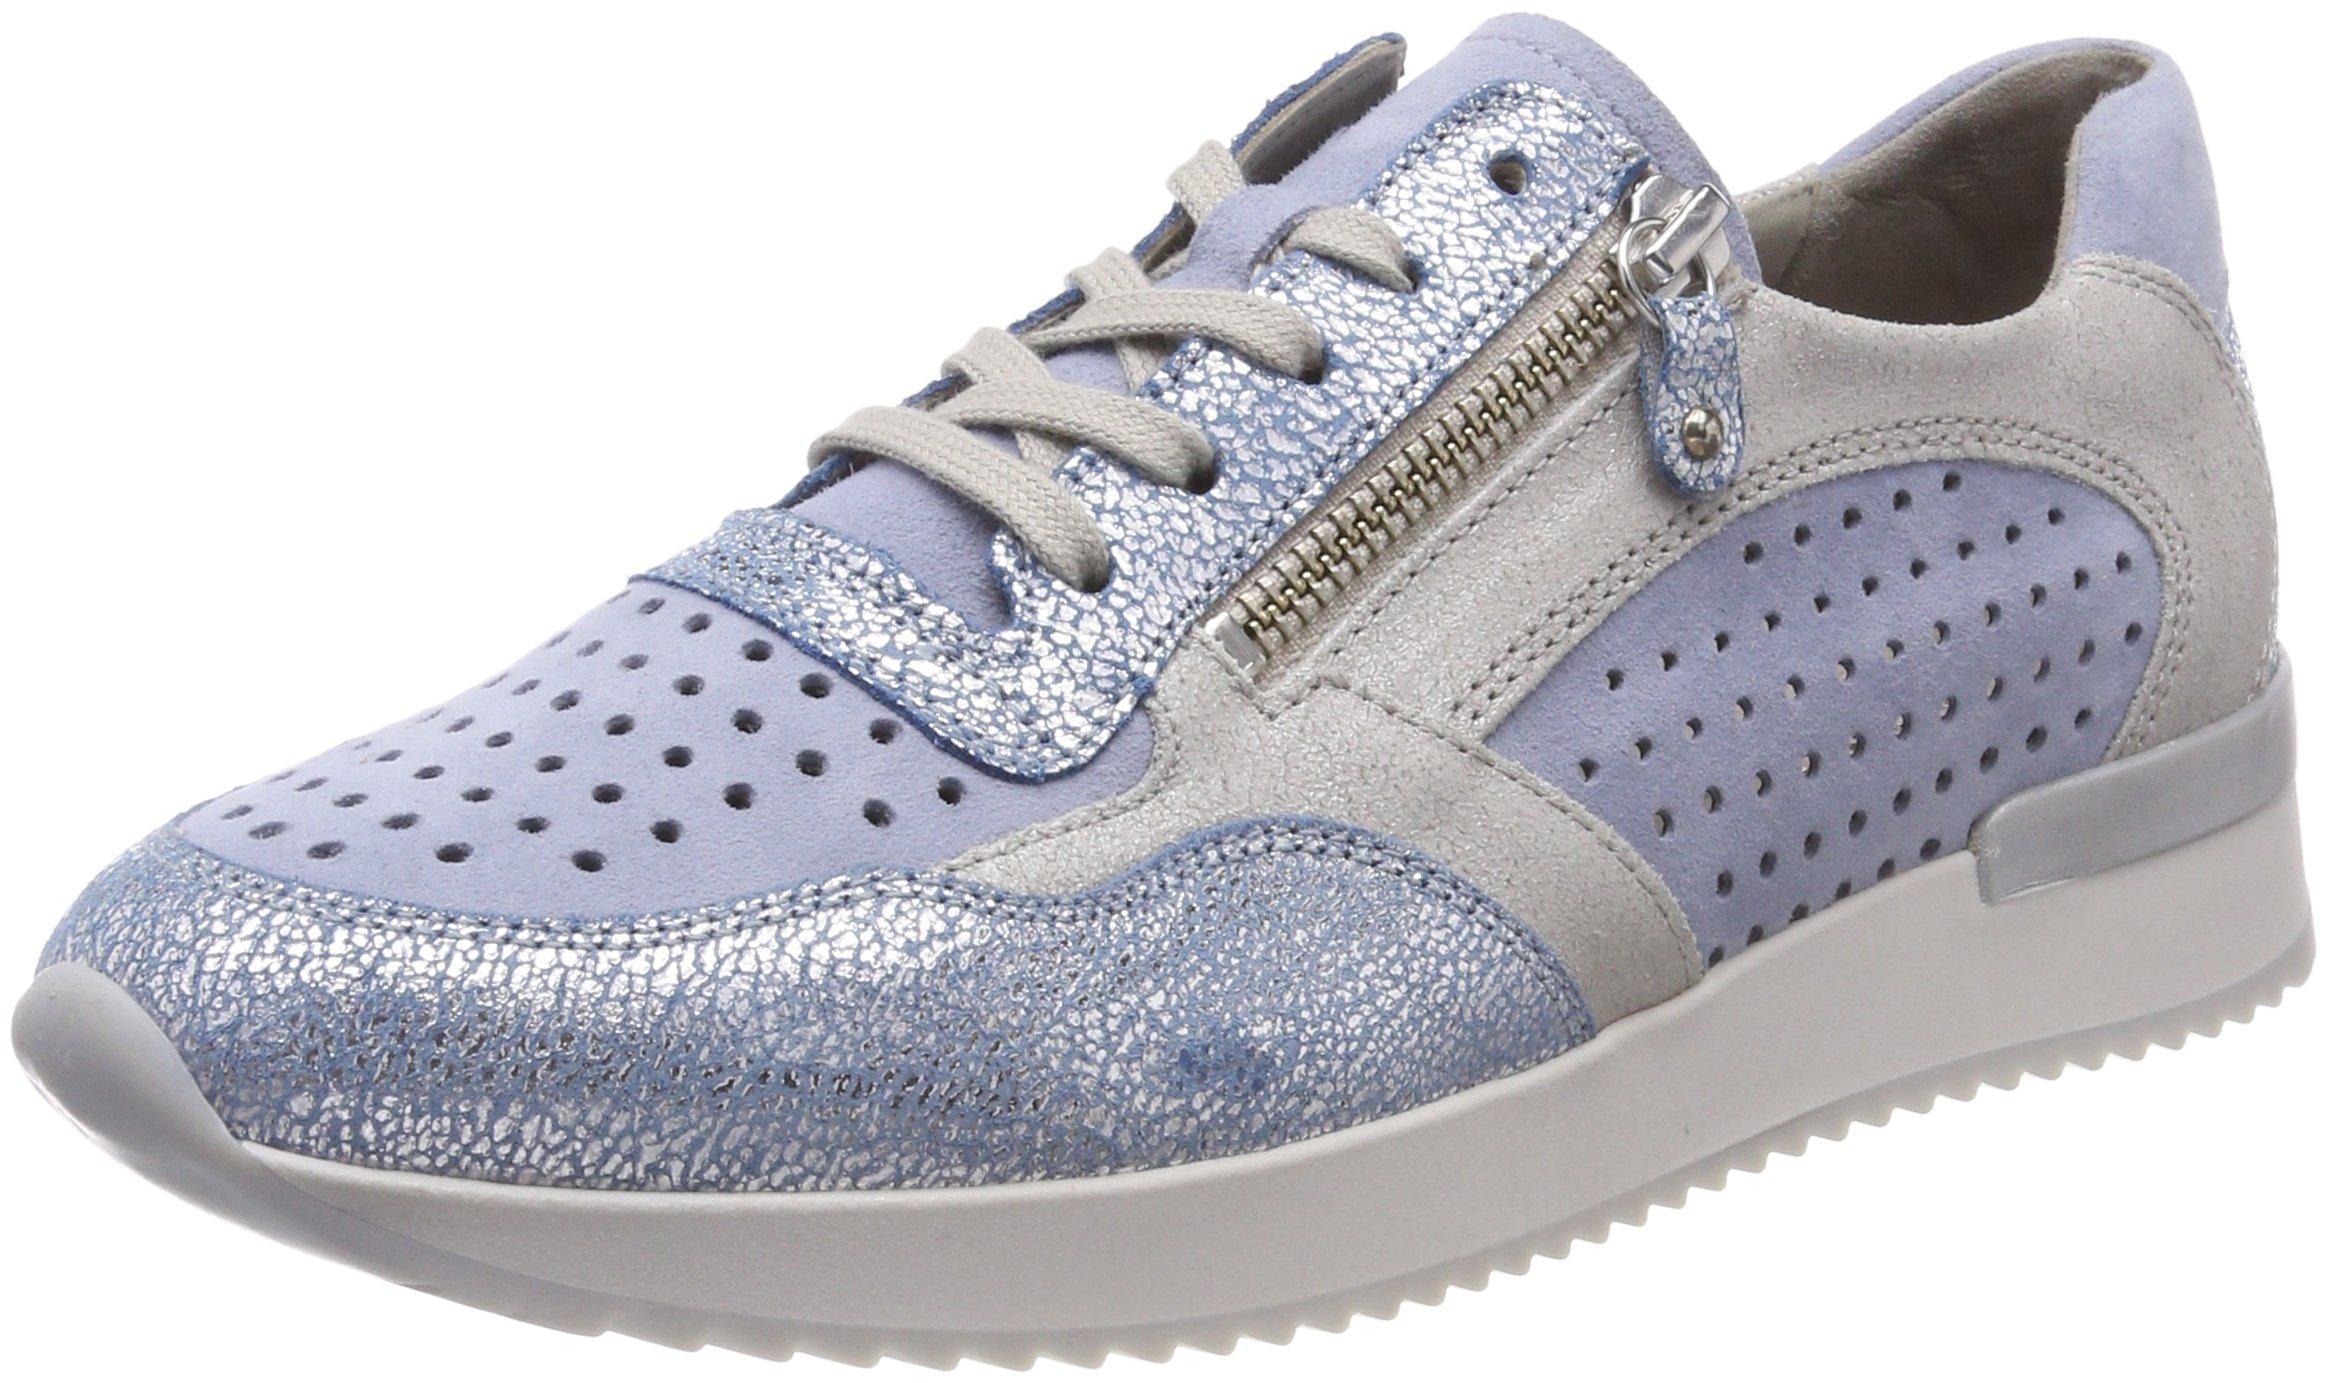 Eu Shoes CasualDerbys Gabor FemmeBleucielo aquamargen41 5AR34jL